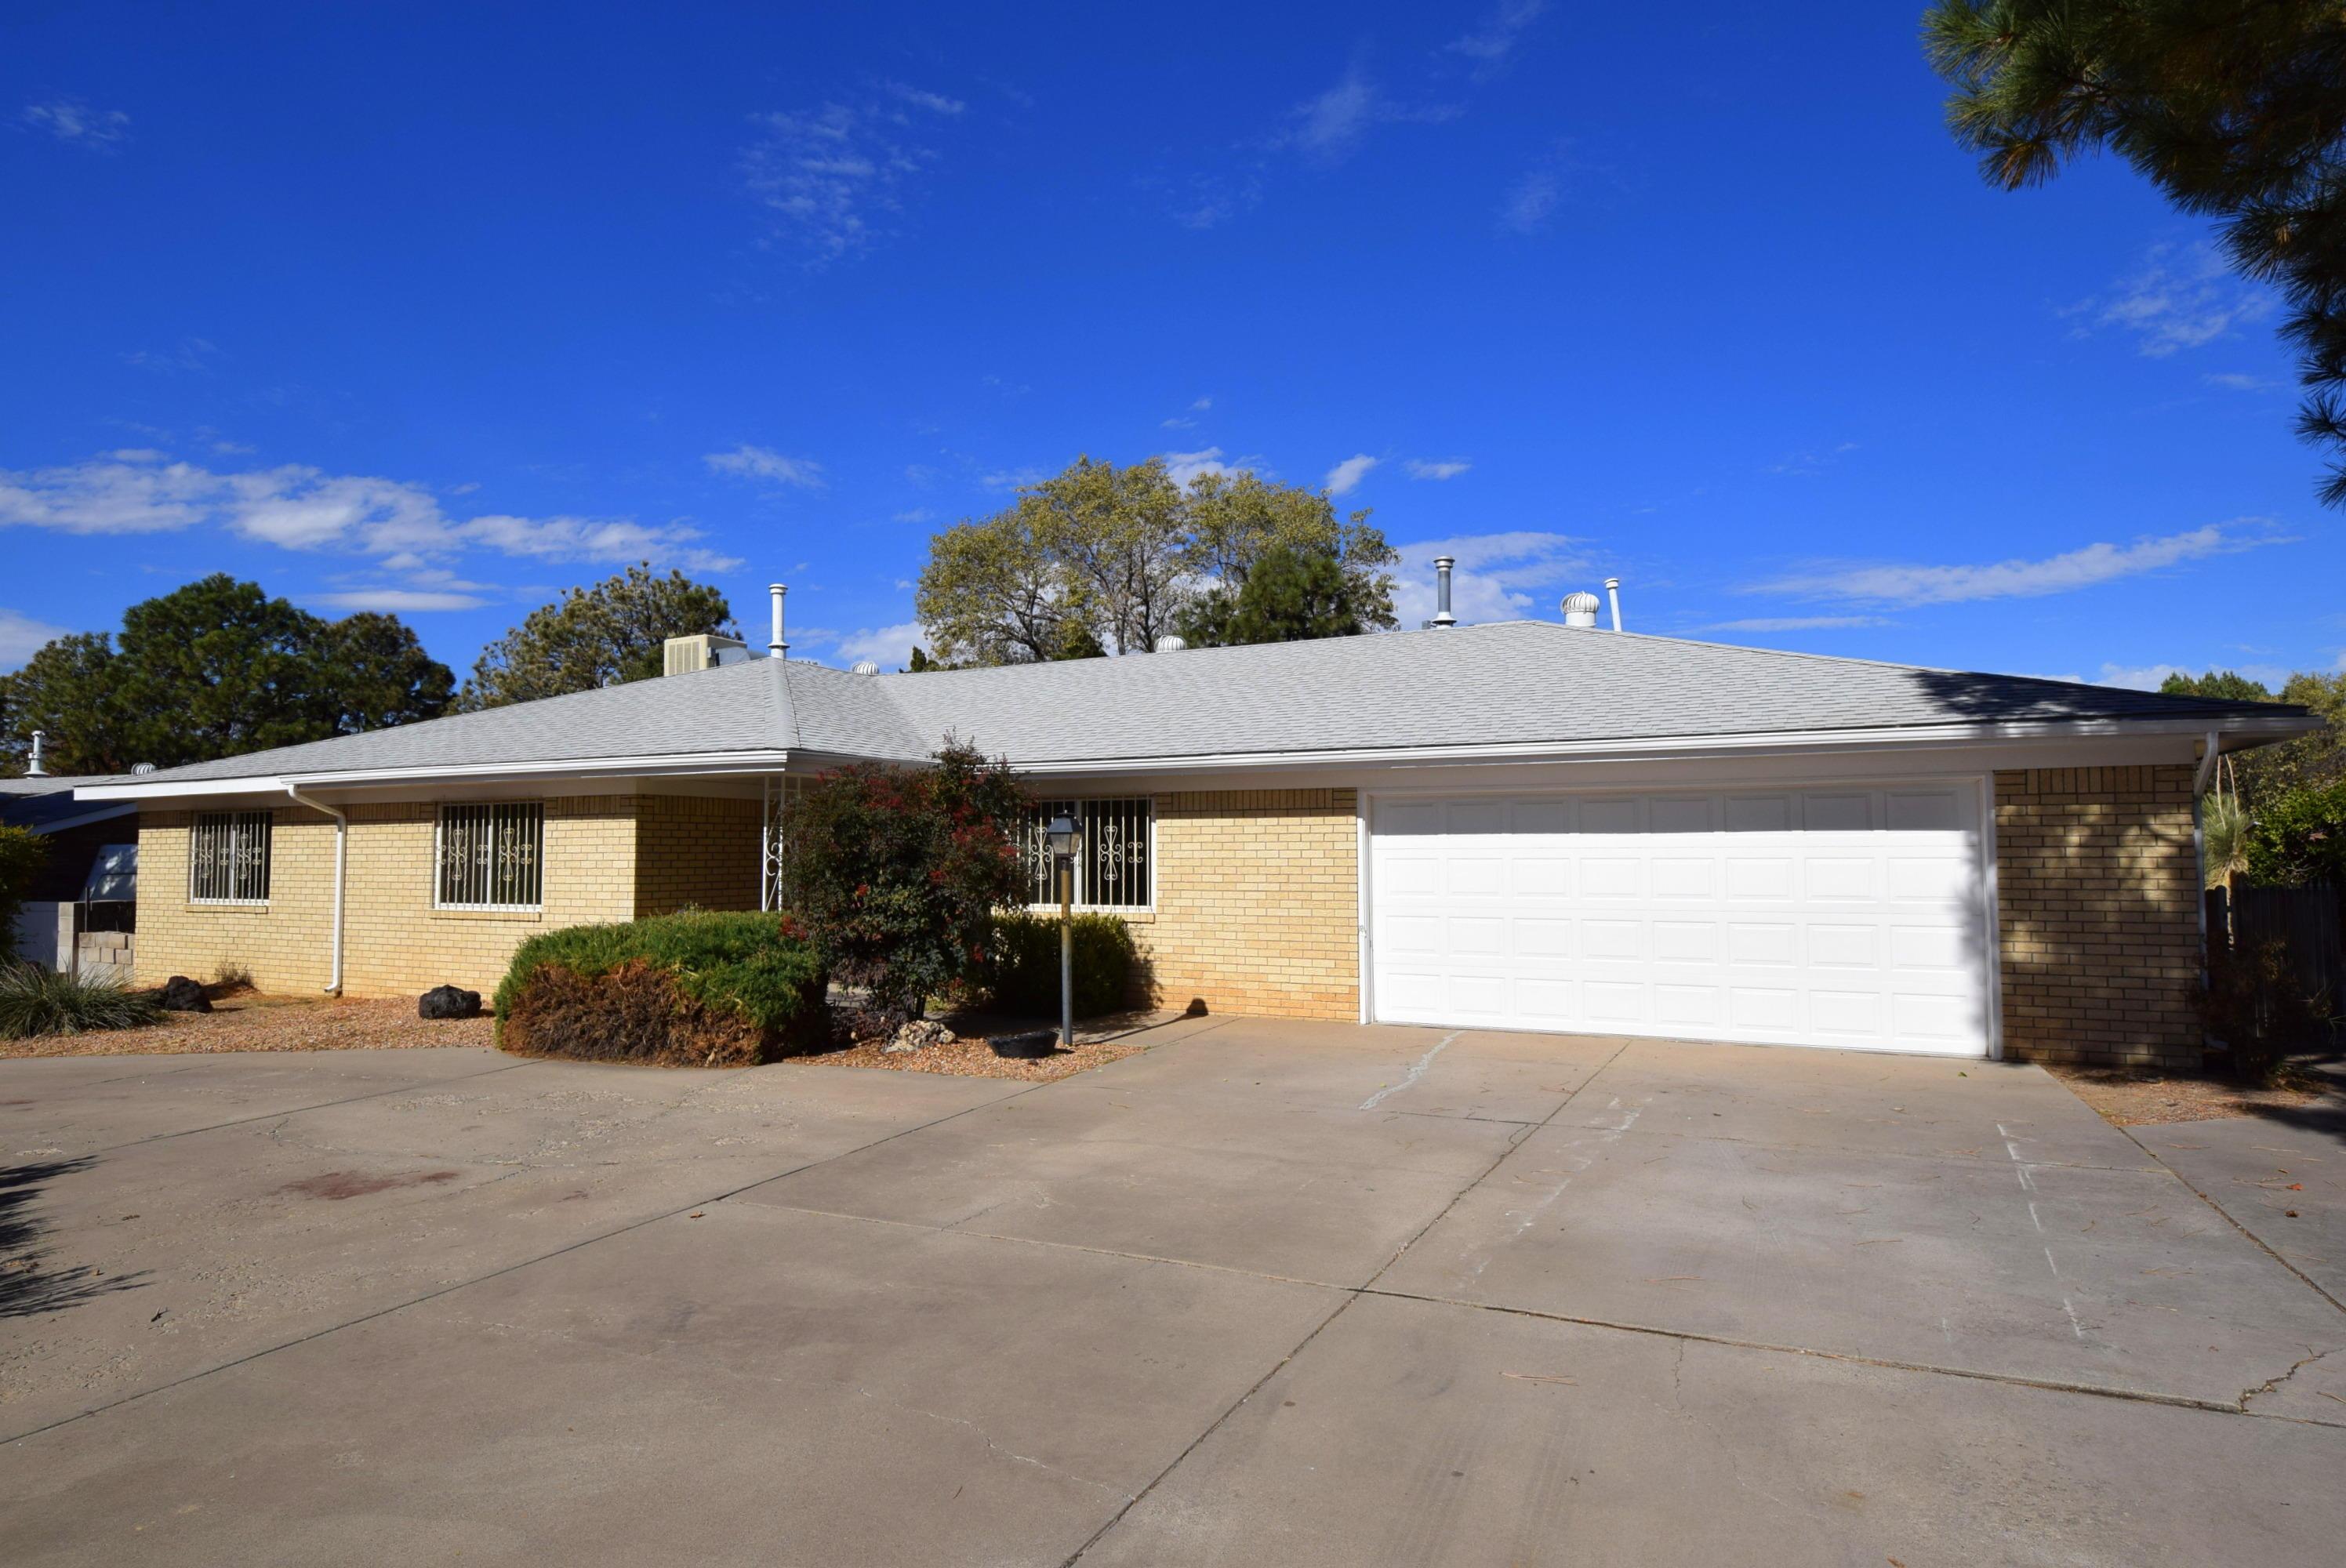 6509 Arroyo Del Oso Avenue, Albuquerque NM 87109